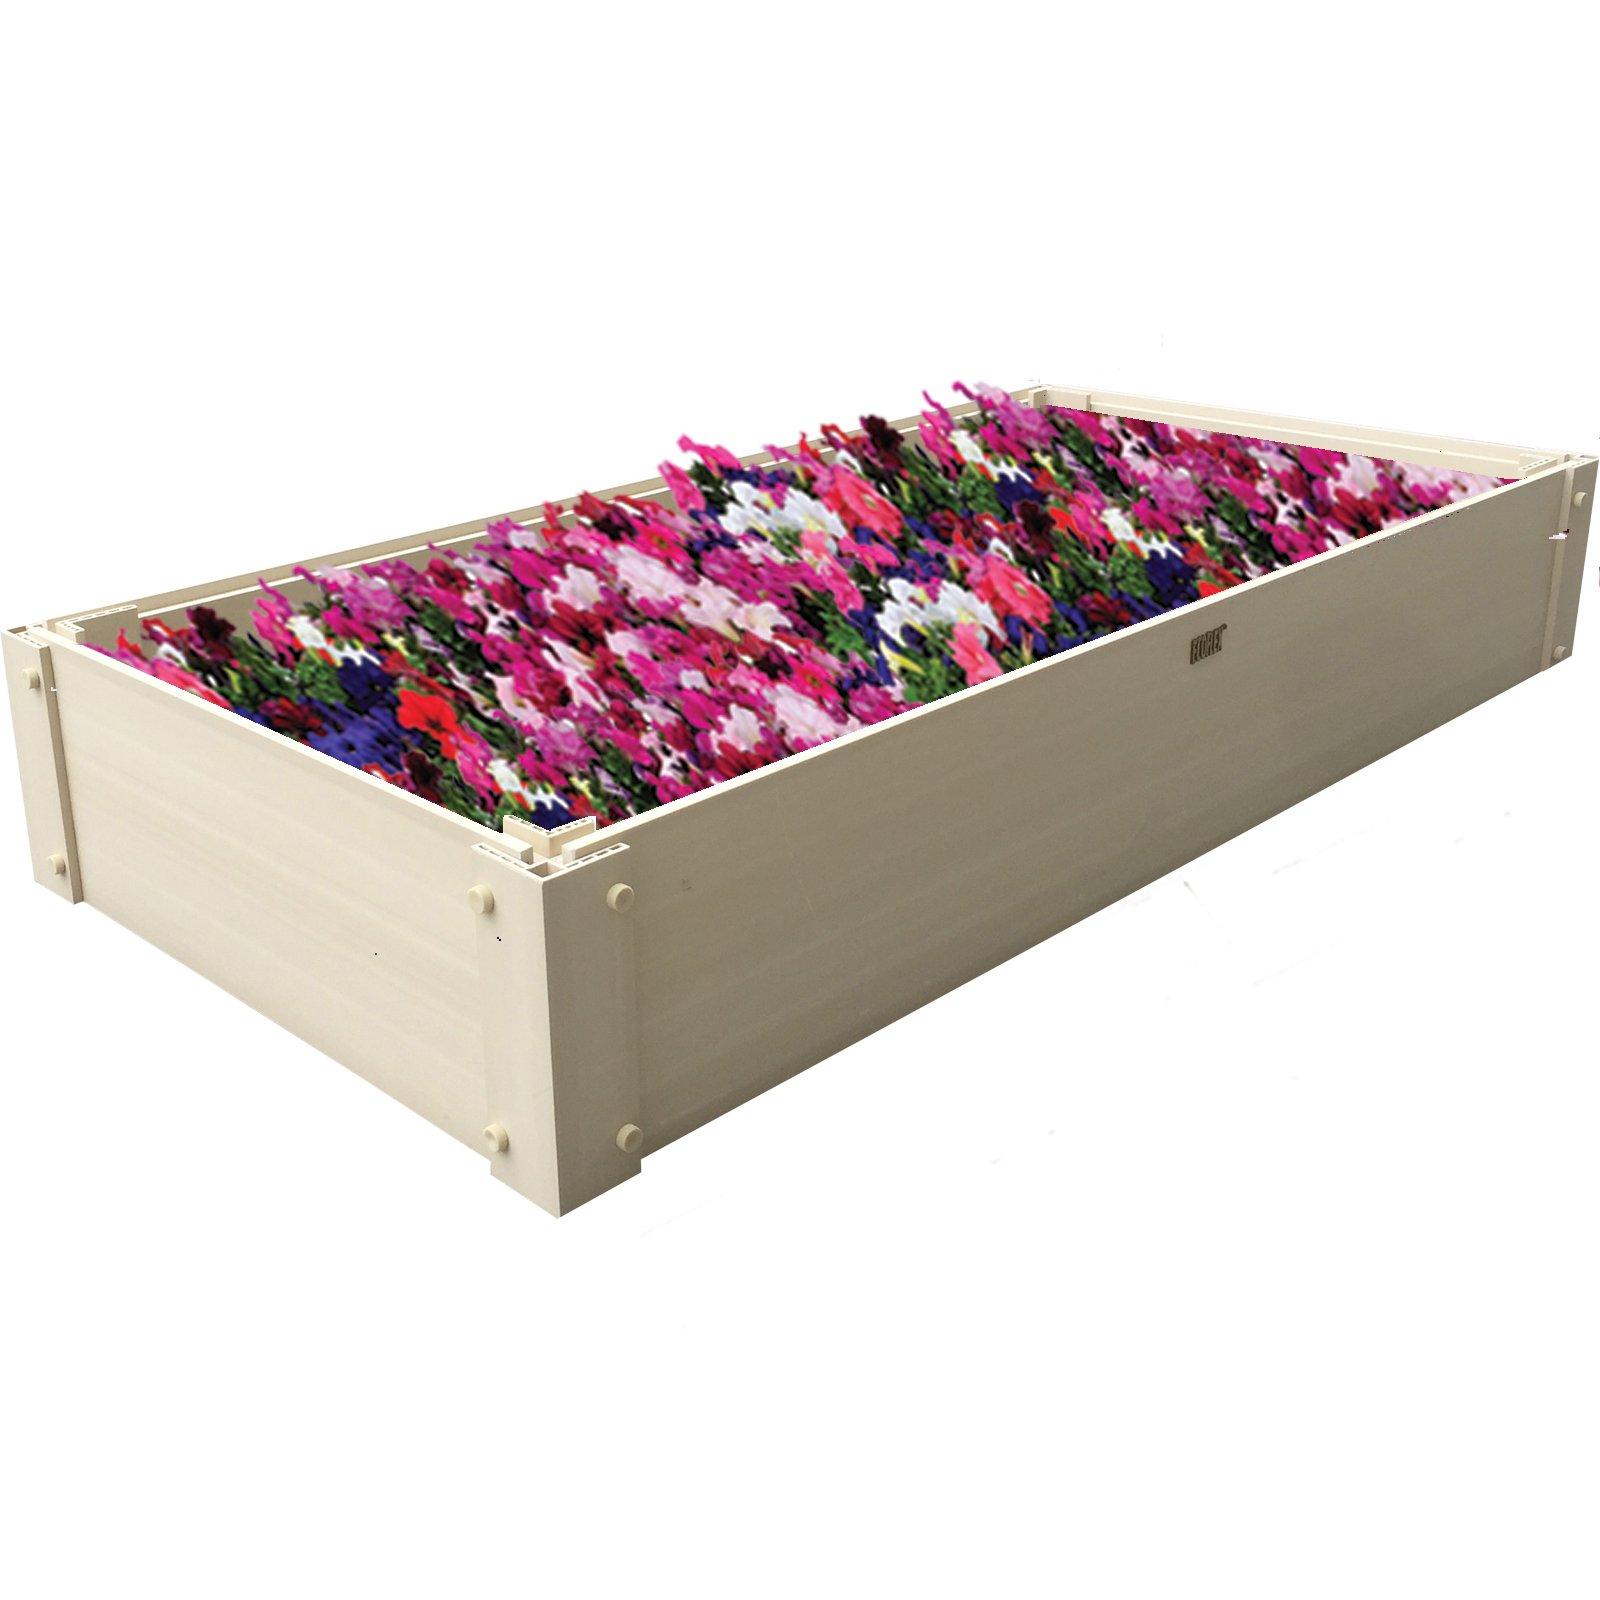 New Age Garden ecoFLEX 2' X 4' Stackable Garden Bed